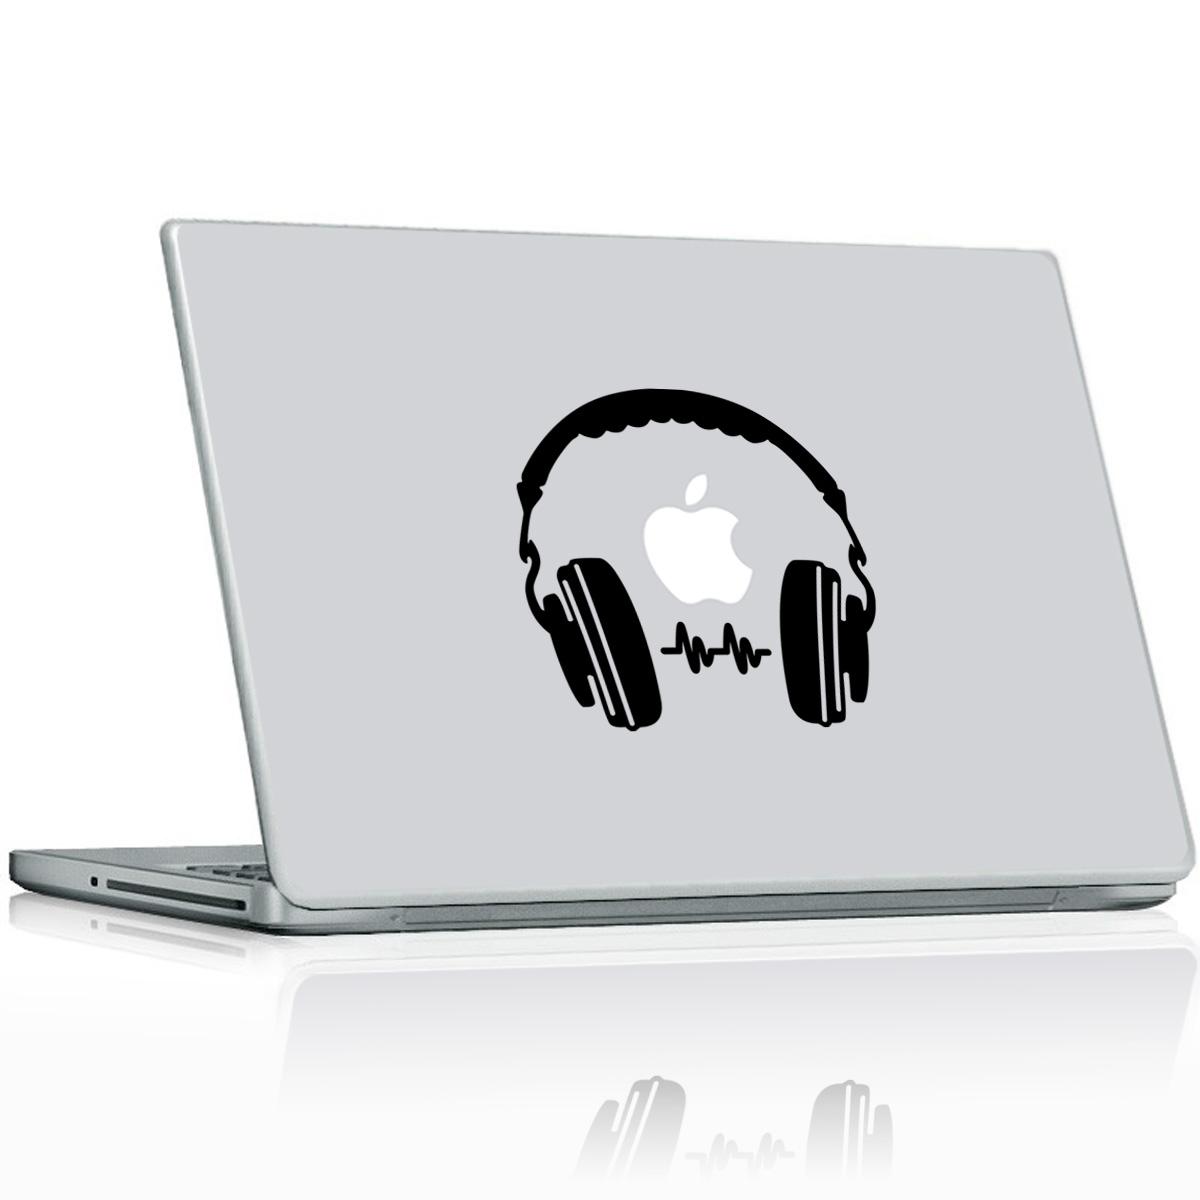 stickers ordinateurs portables sticker casques pour mac ambiance. Black Bedroom Furniture Sets. Home Design Ideas